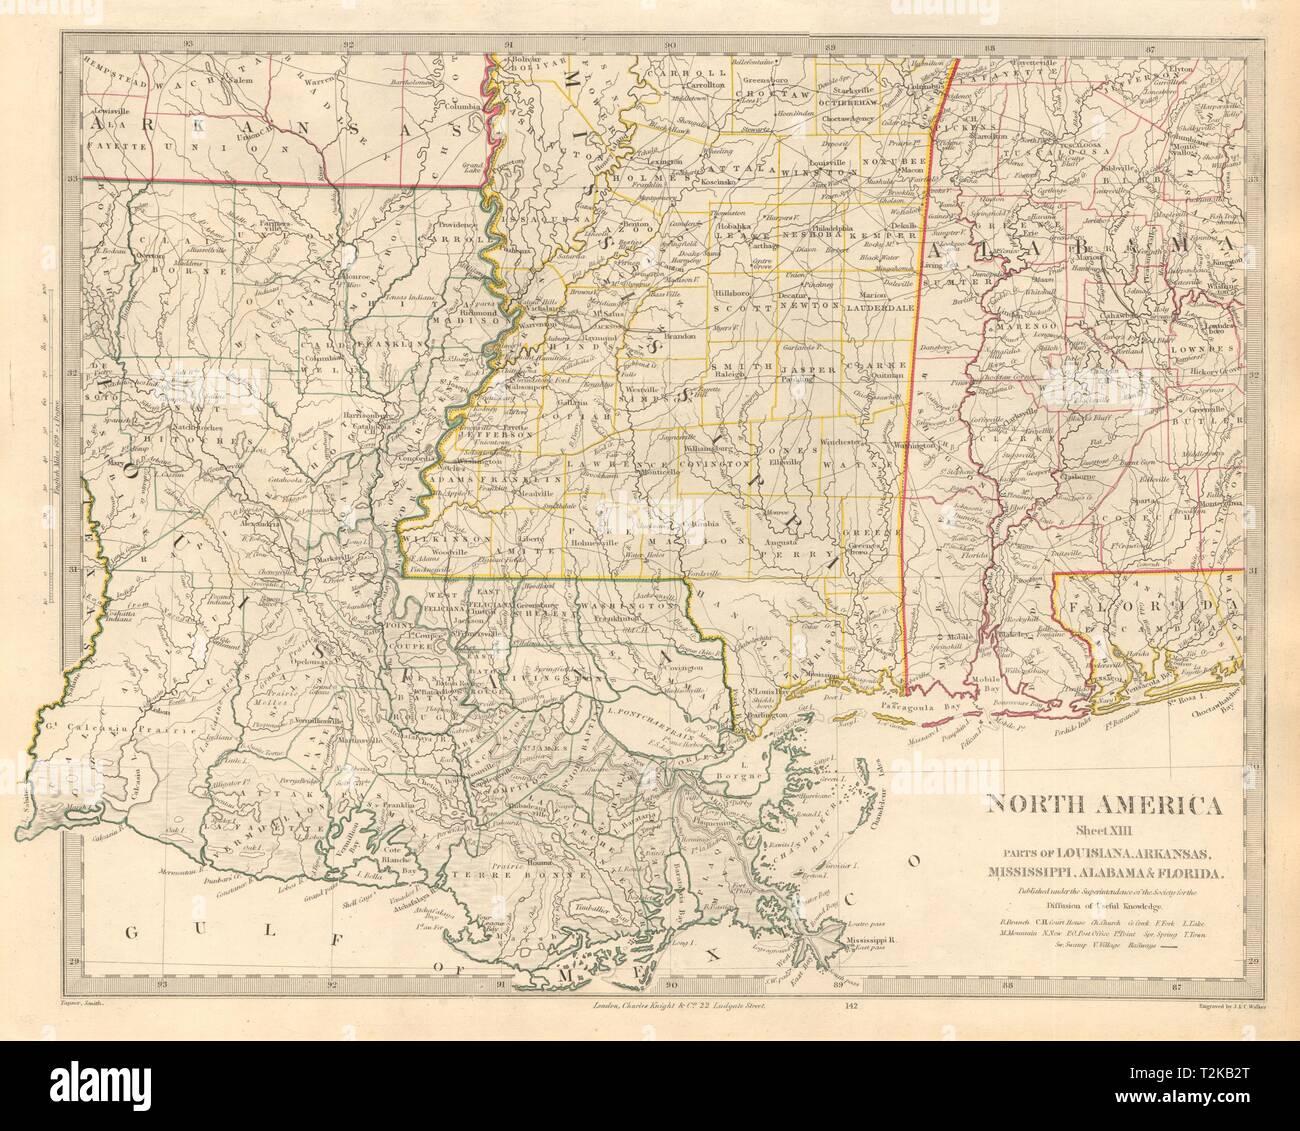 US GULF COAST. Louisiana Mississippi Alabama Florida ...